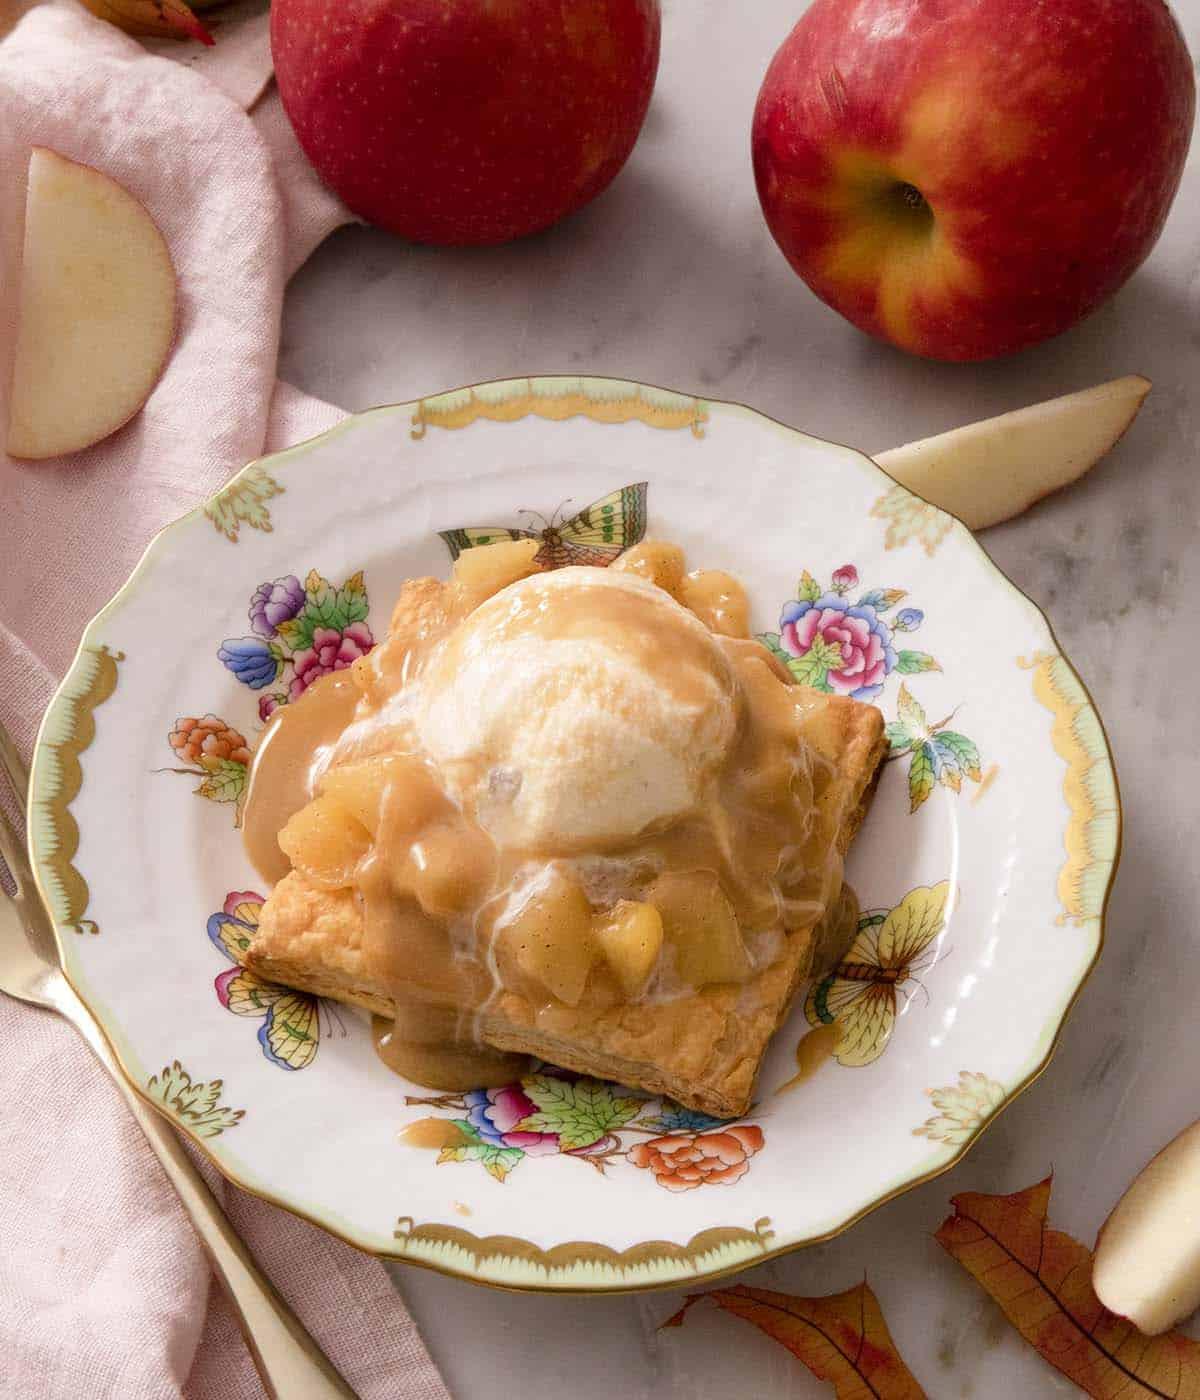 Icre cream melting on a apple tart.